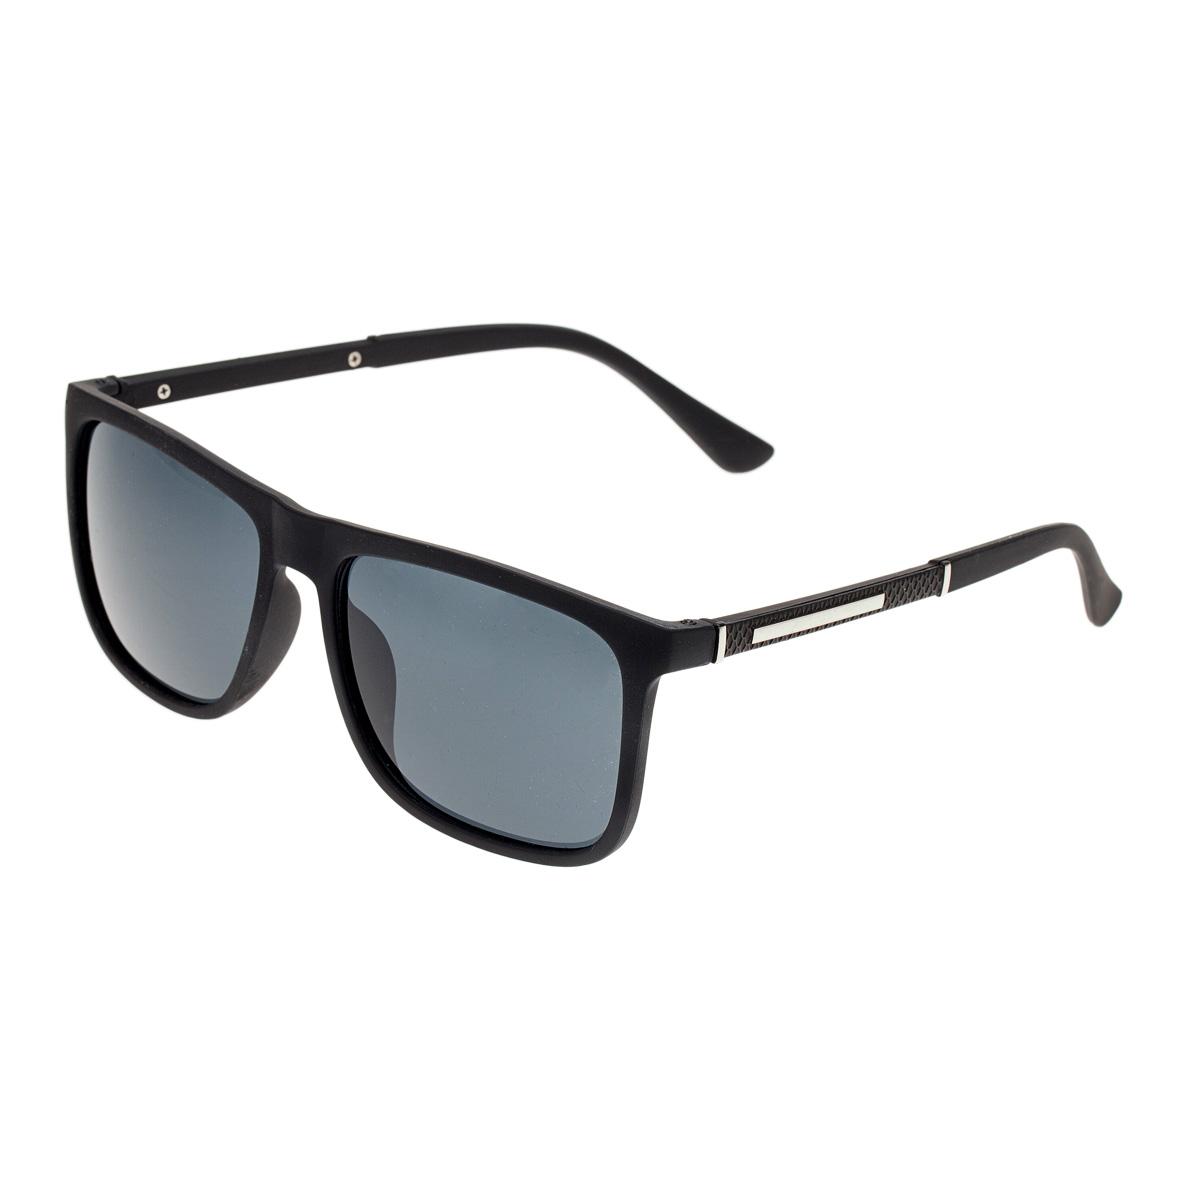 Фото - Очки солнцезащитные Sevenext, 23032-53 очки солнцезащитные sevenext 23032 28